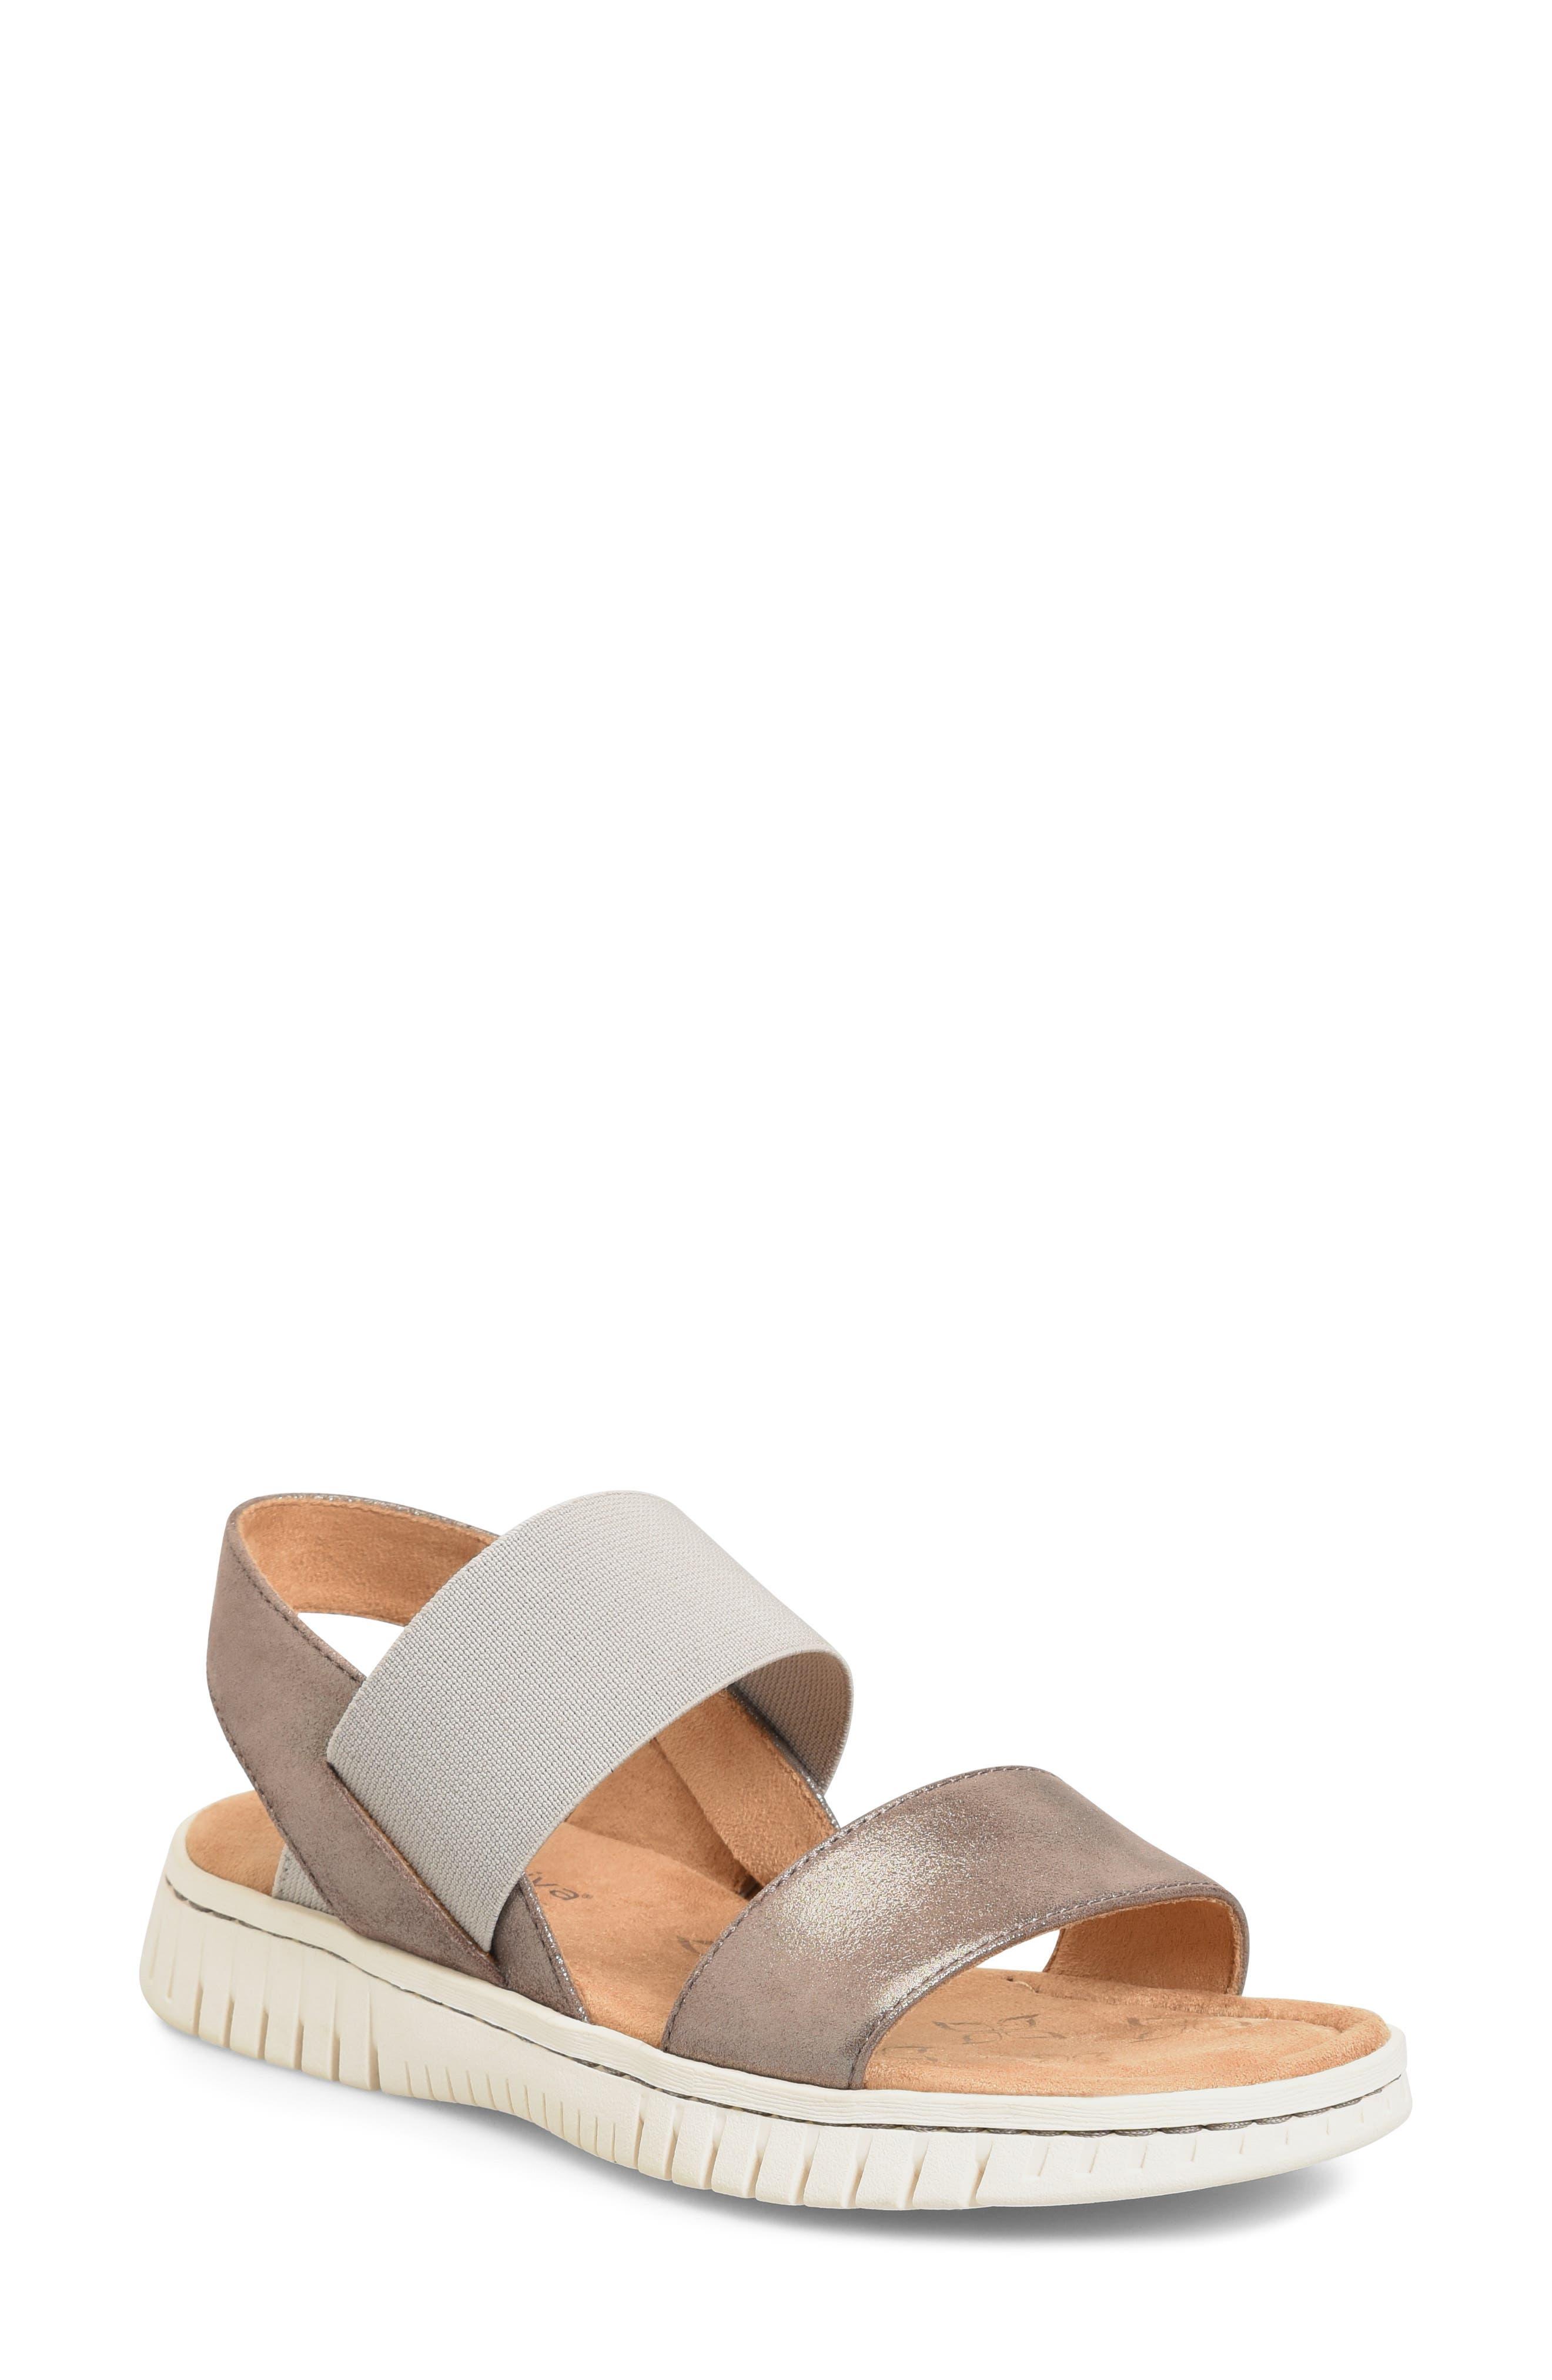 Charlee Slingback Sandal